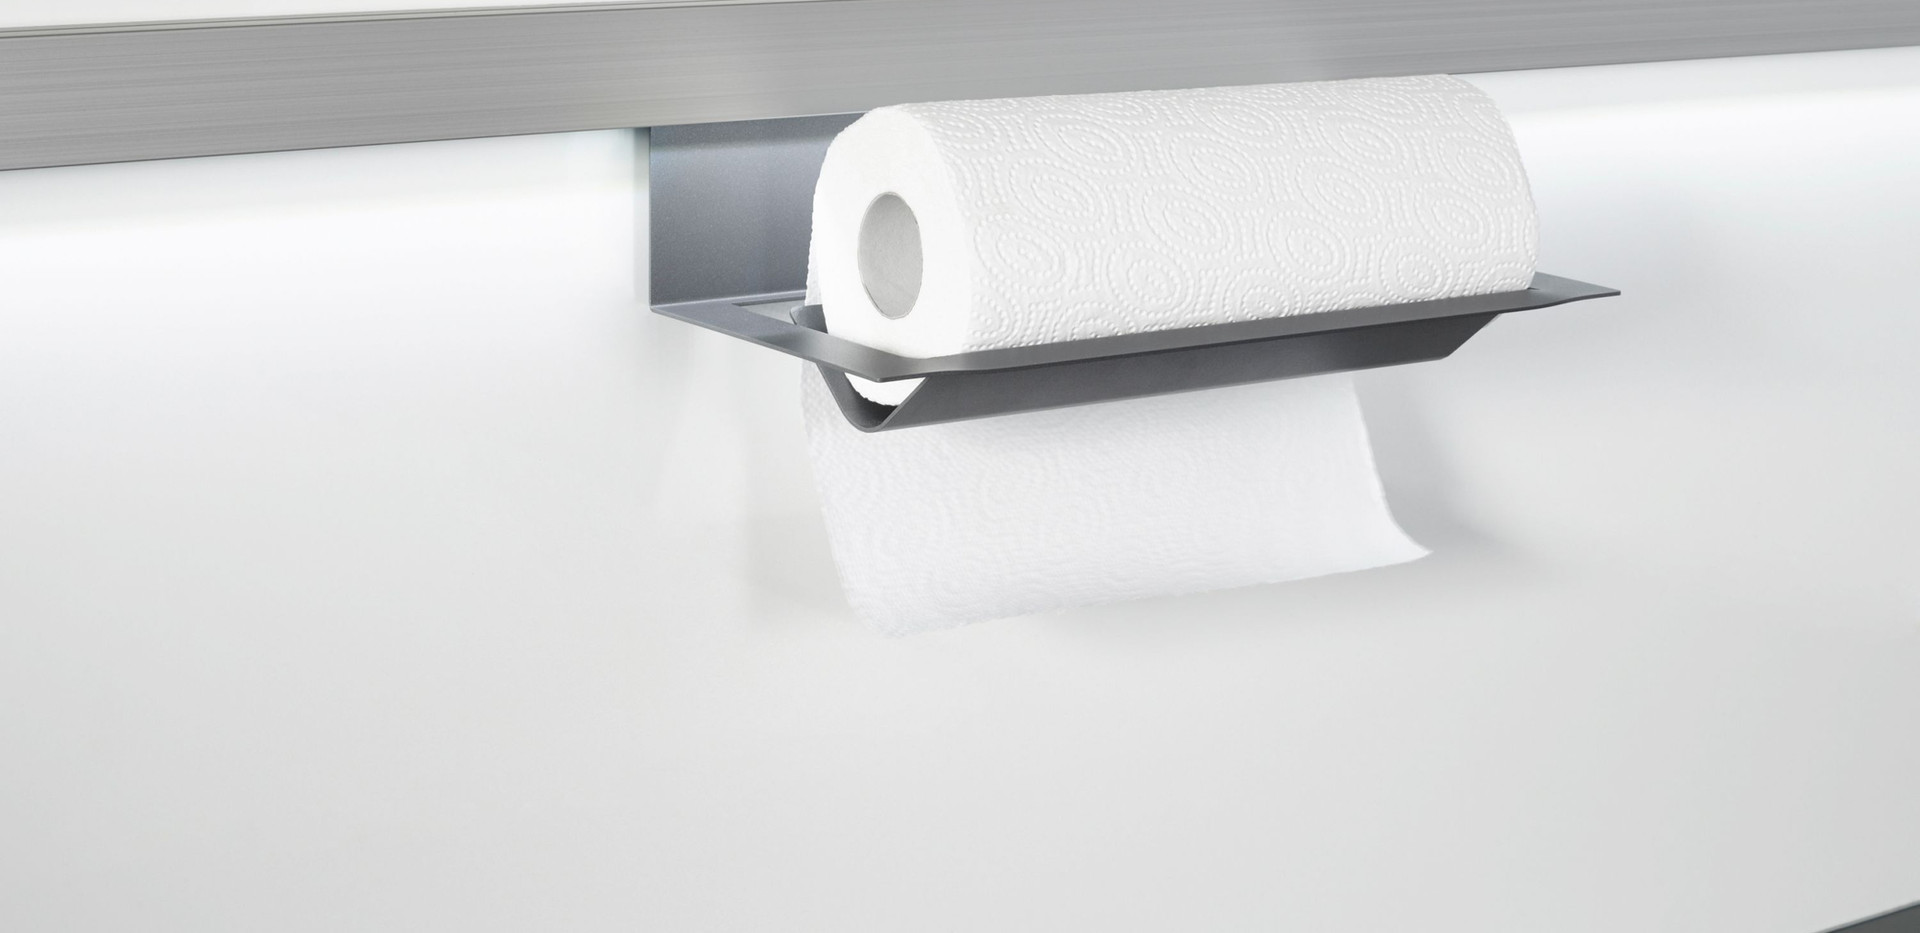 LINERO MOSAIQ Paper Roll Holder